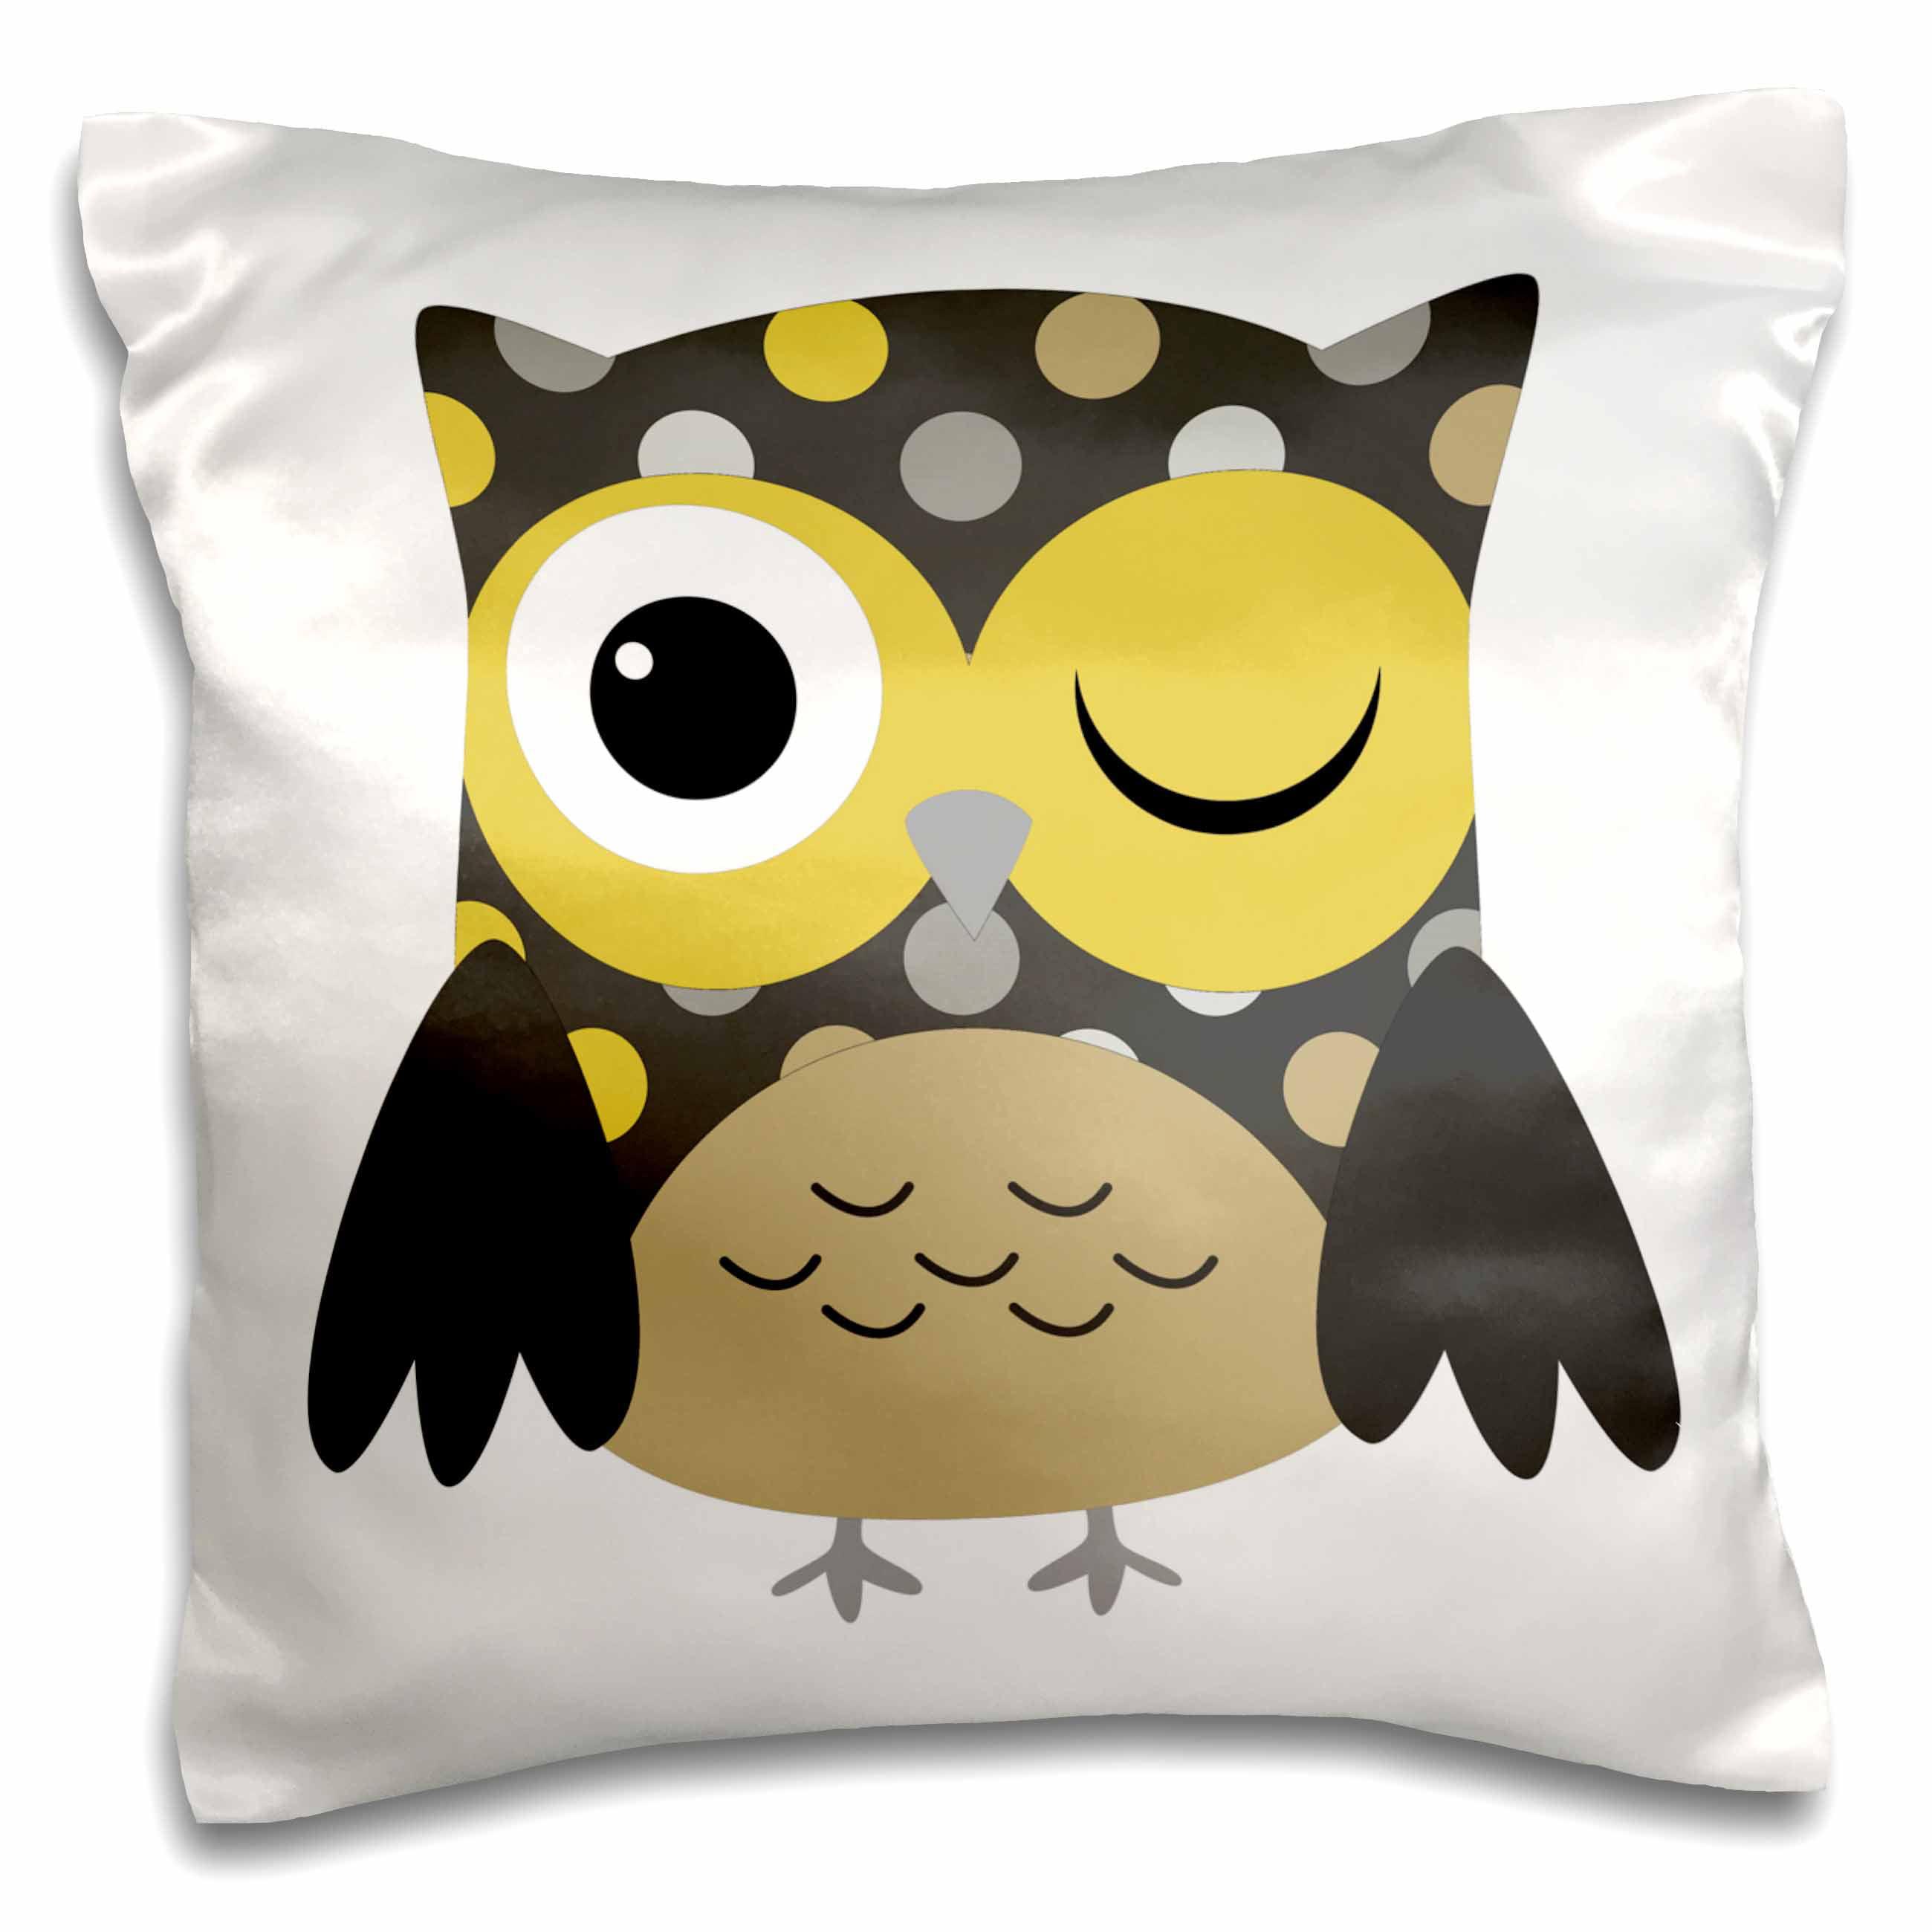 3dRose Cute Yellow Polka Dot Owl, Pillow Case, 16 by 16-inch